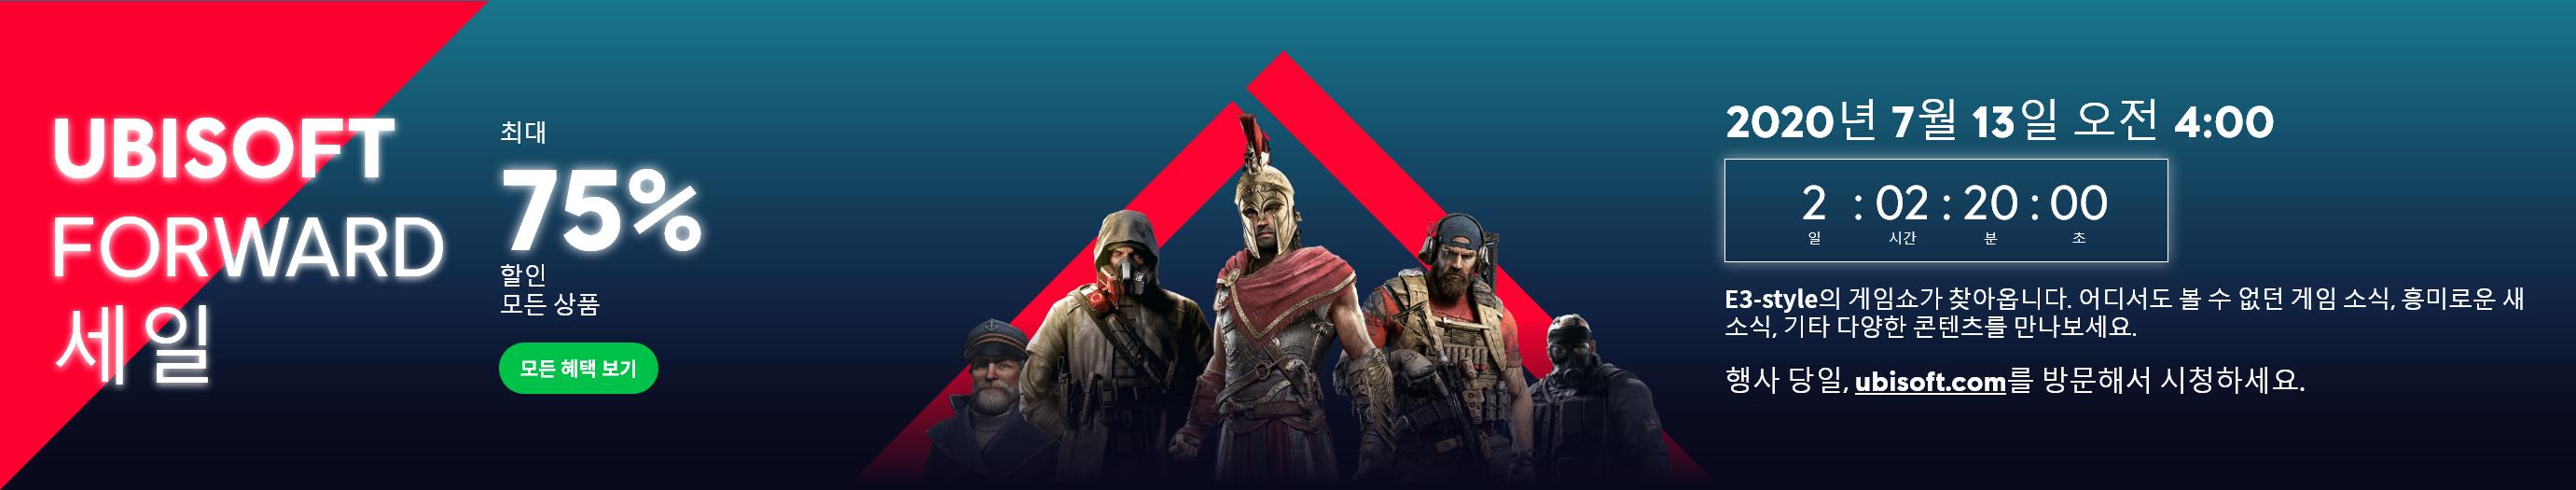 Screenshot_2020-07-11 Ubisoft Store 공식 온라인 스토어.png